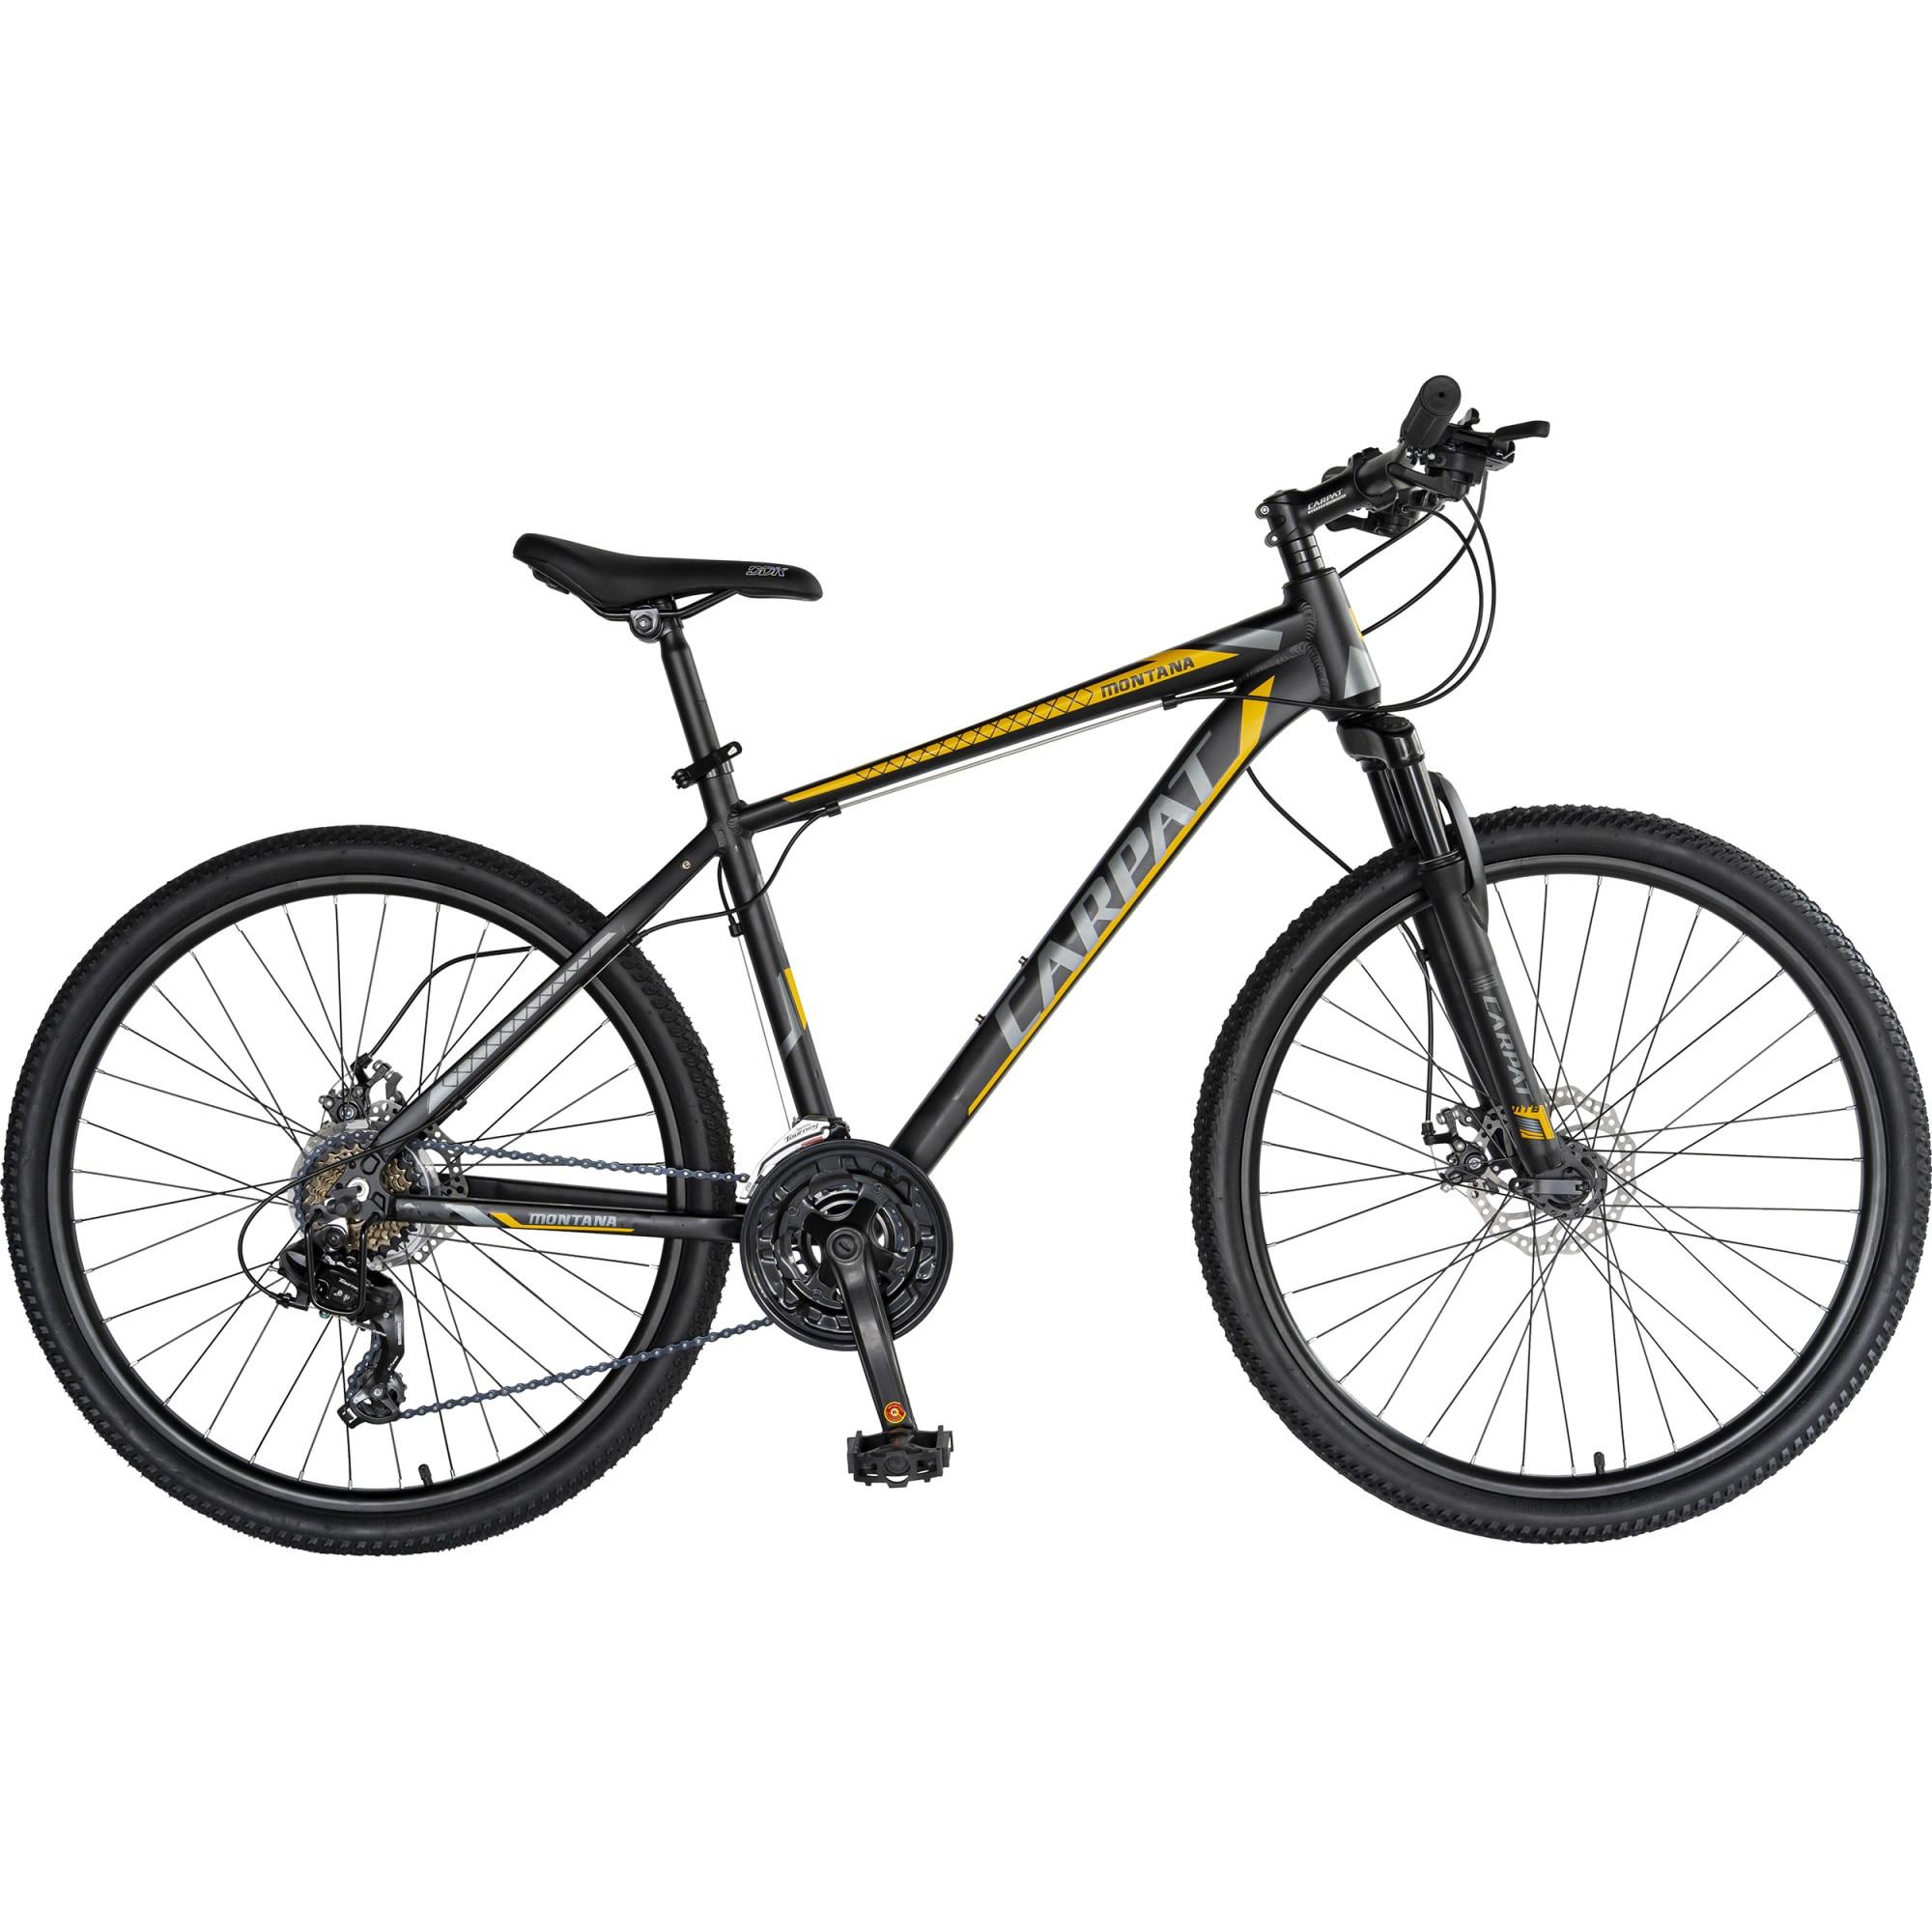 "Fotografie Bicicleta MTB 26"" Carpat C2670C, Negru/Galben"